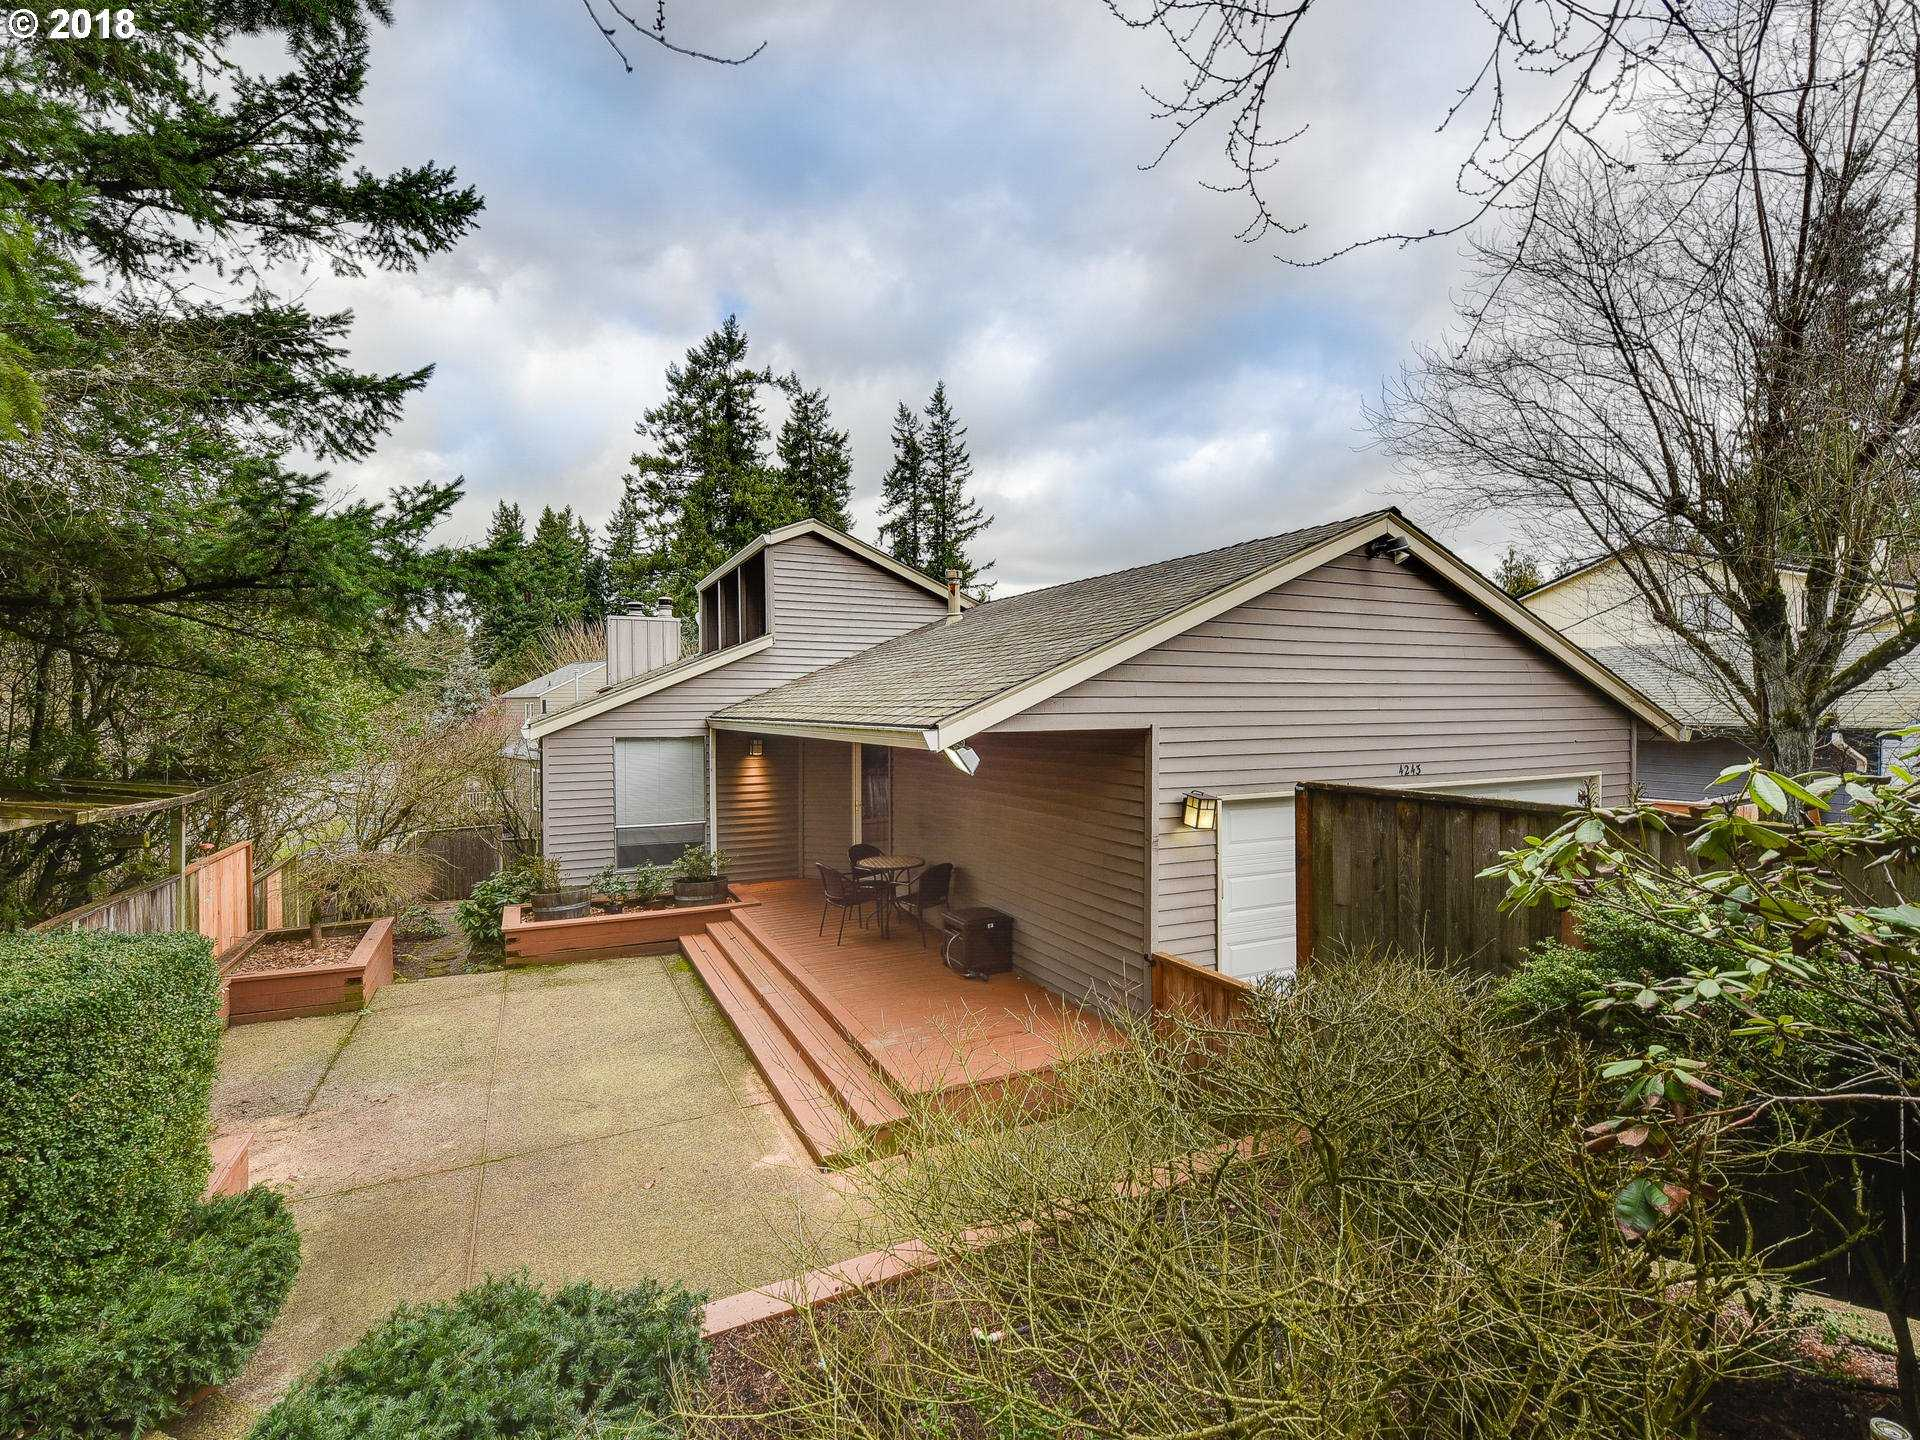 $500,000 - 4Br/3Ba -  for Sale in West Portland Park/mt Park, Portland